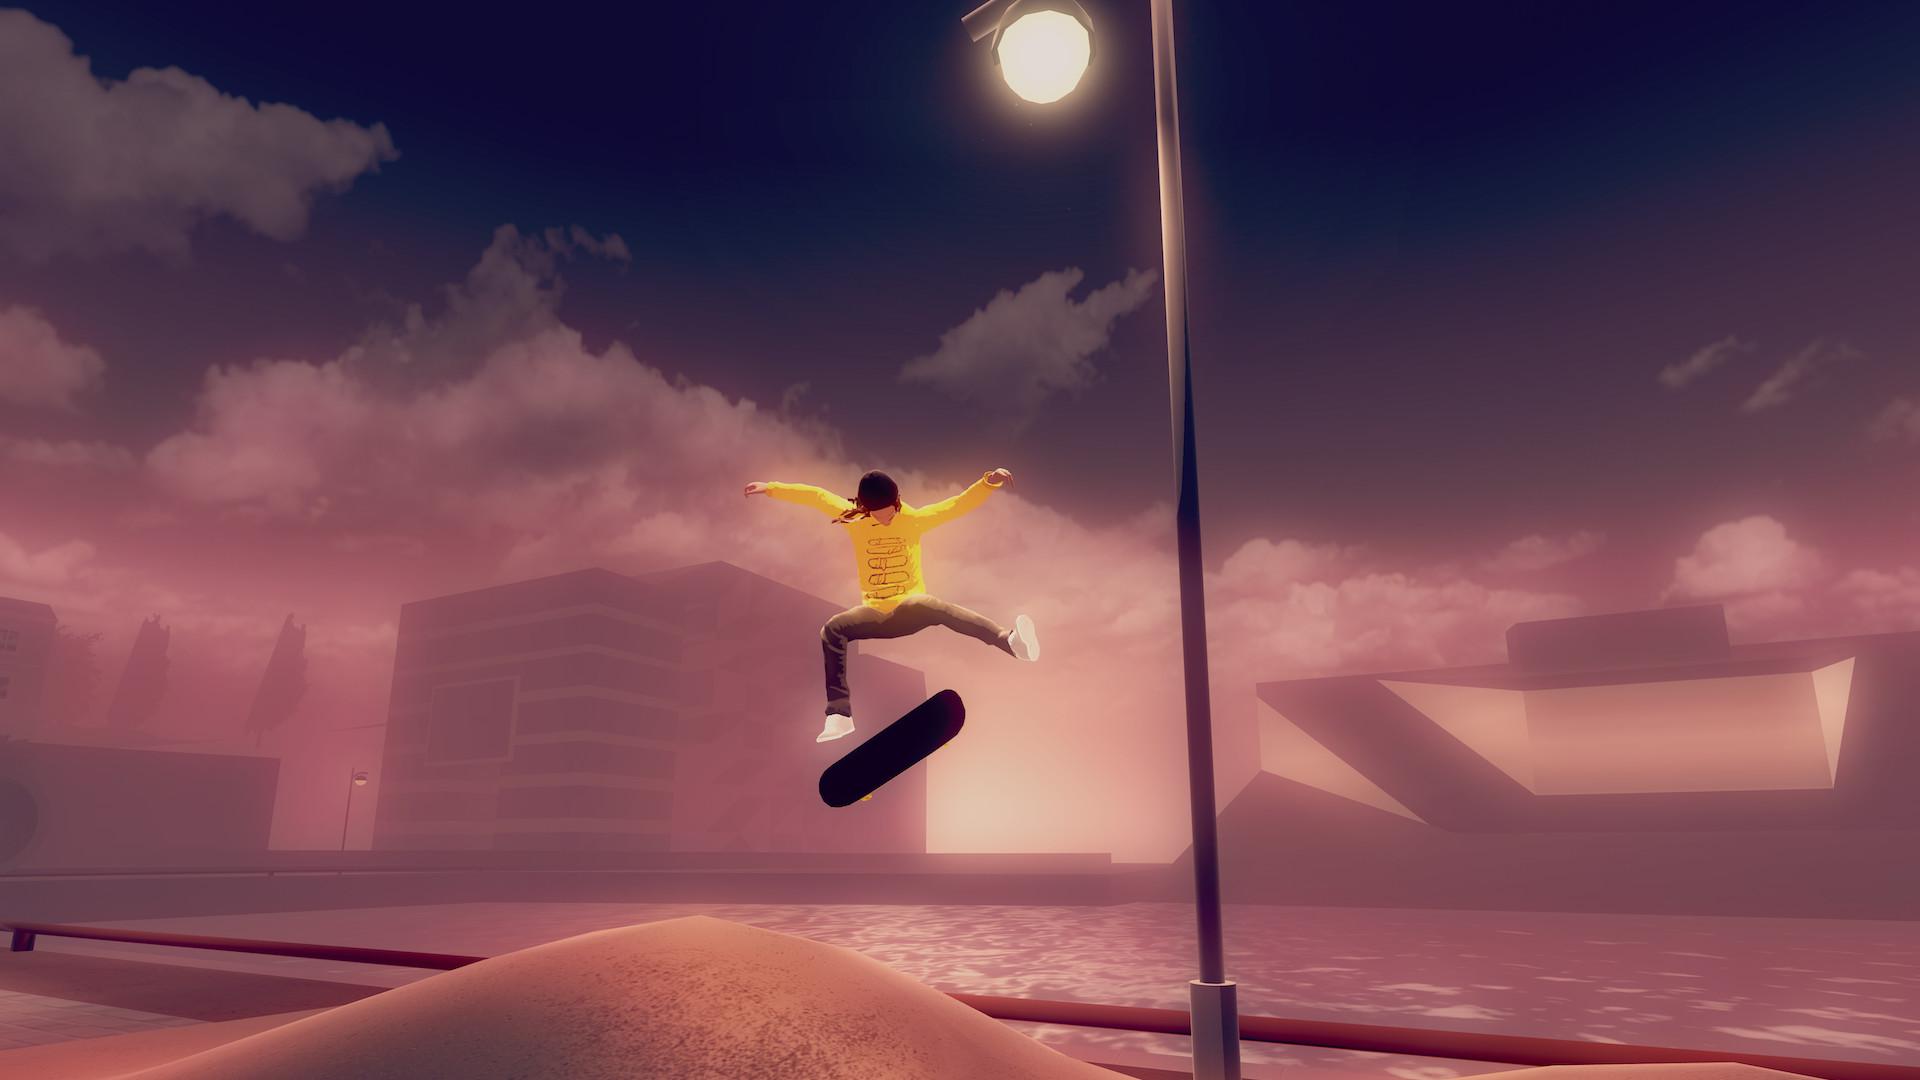 skate city coming soon 7